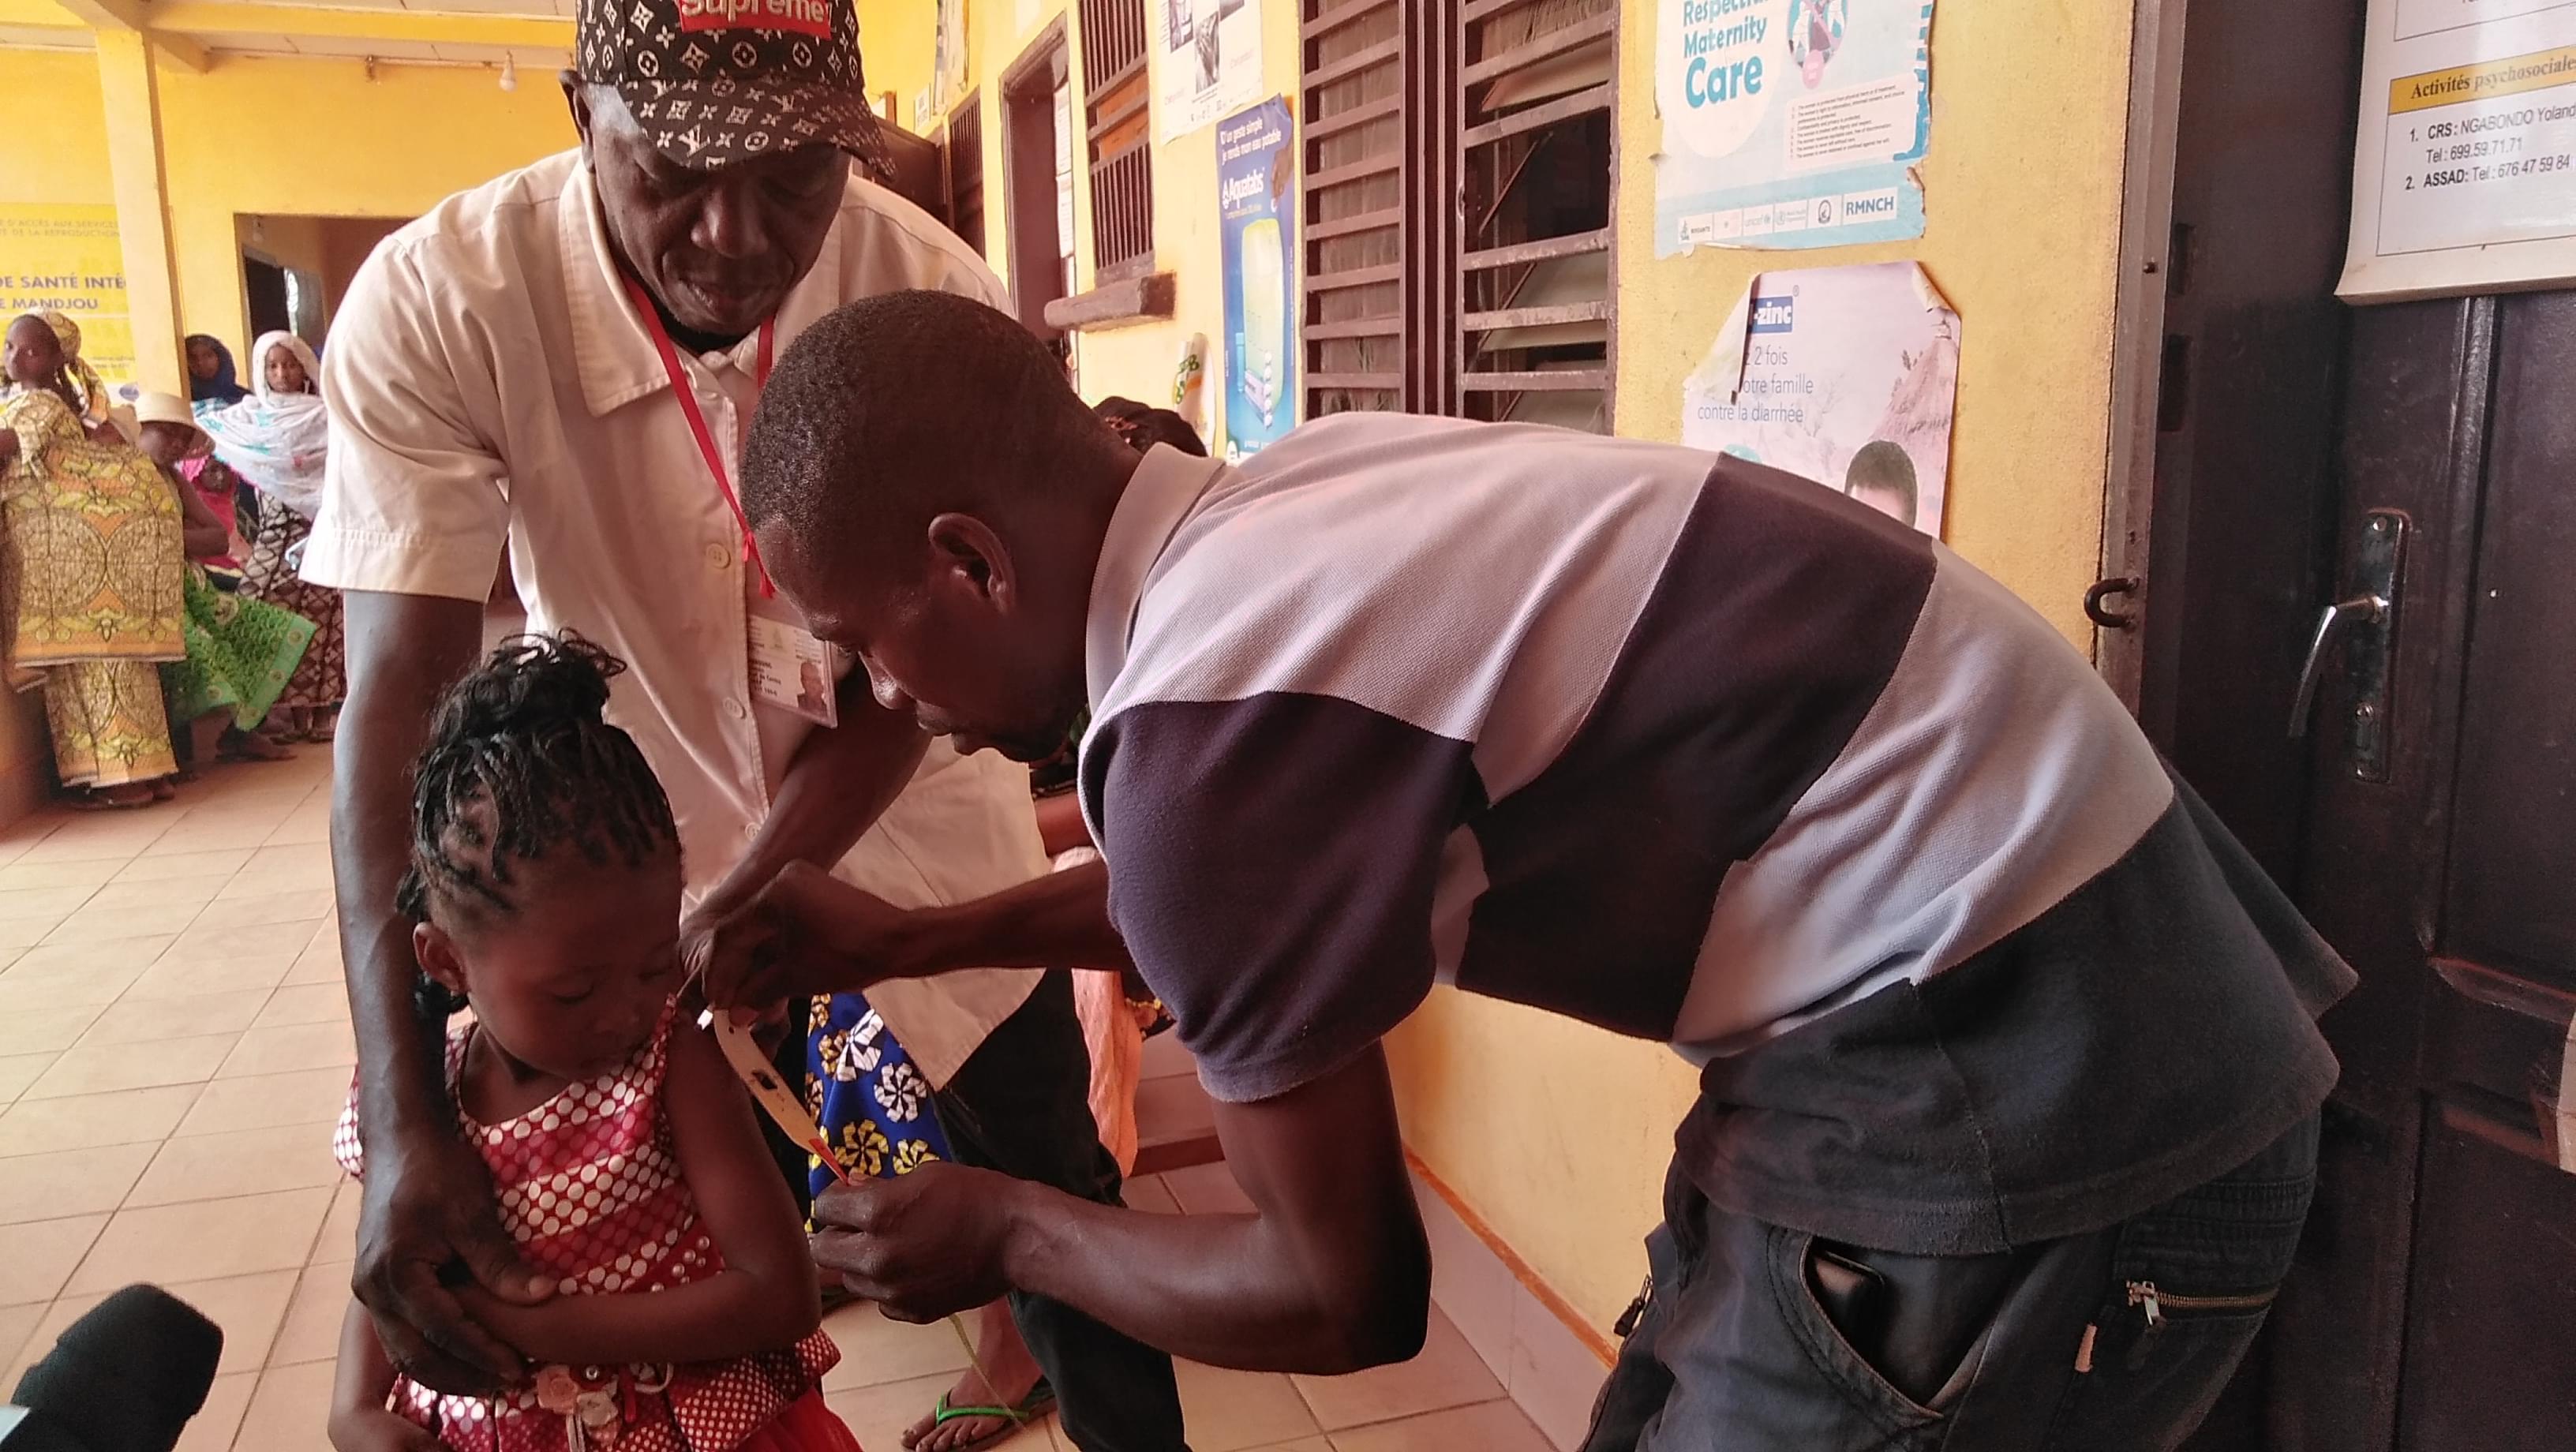 Sub-Saharan Africa : Infant Mortality Reduction Boasts Life Expectancy